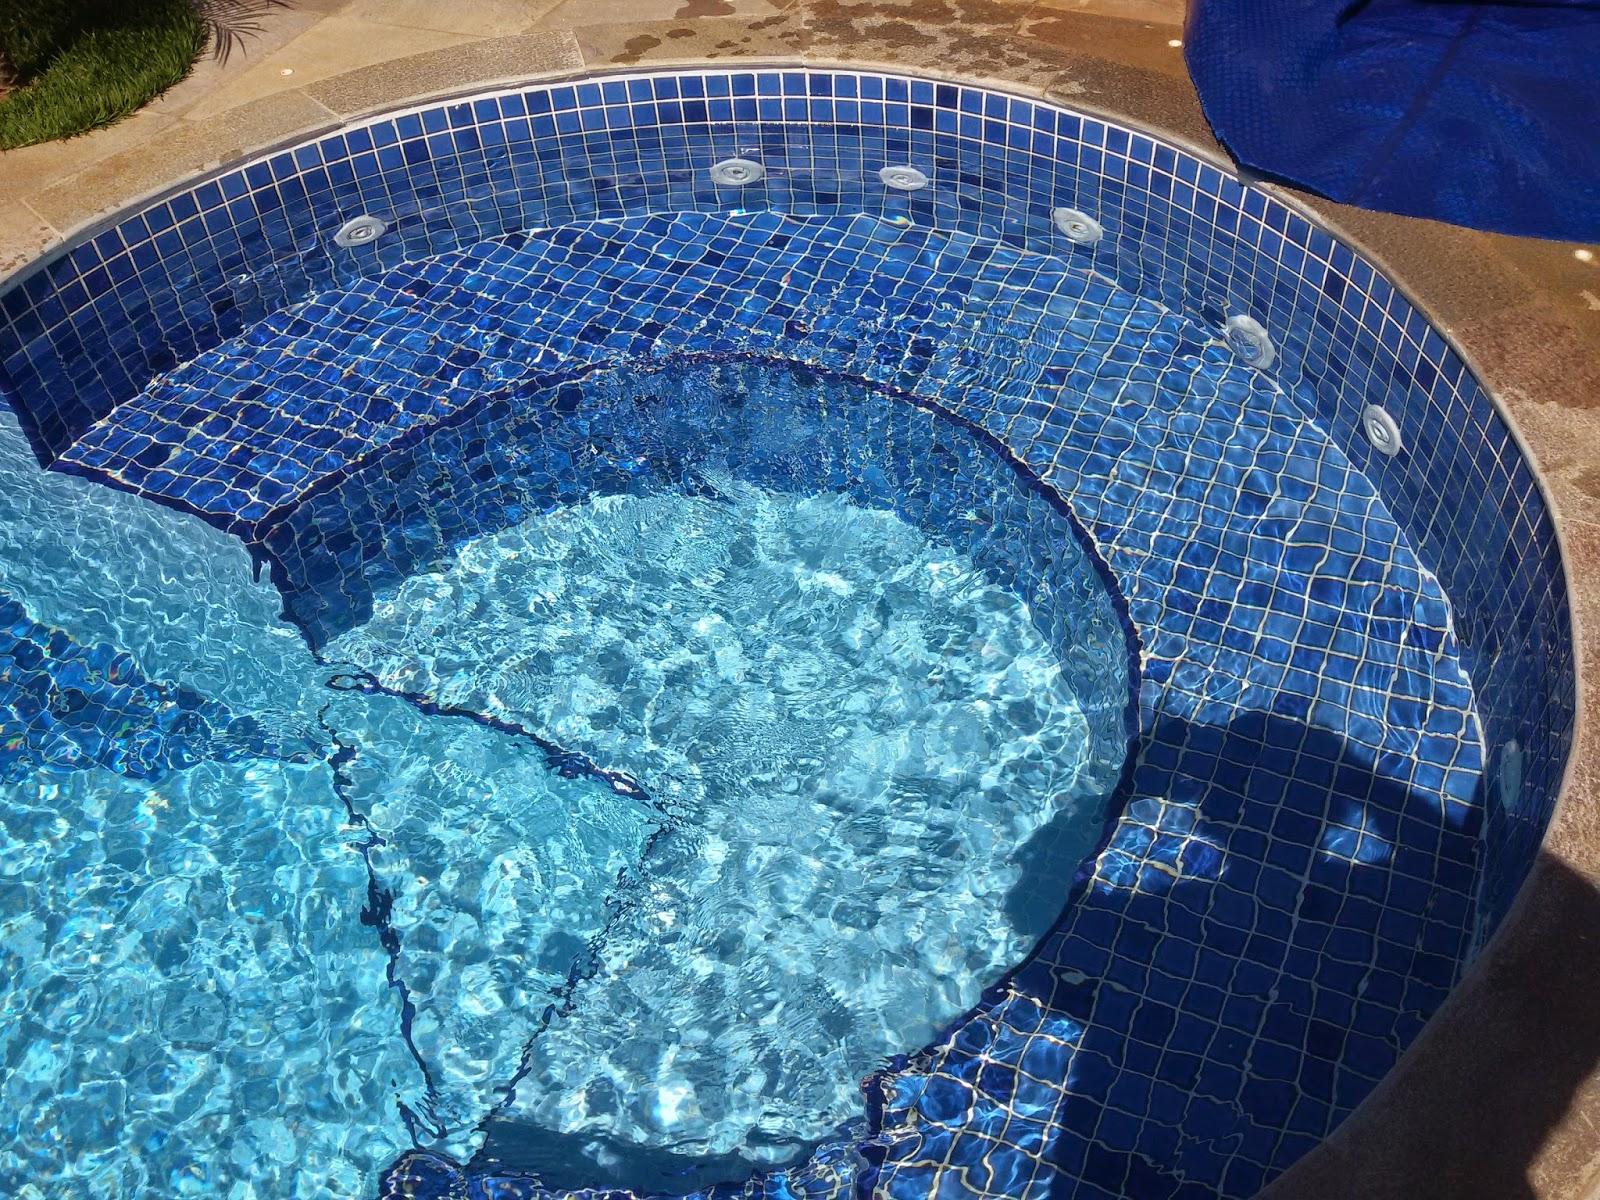 Park way piscinas pastilhas for Piscina 6 x 3